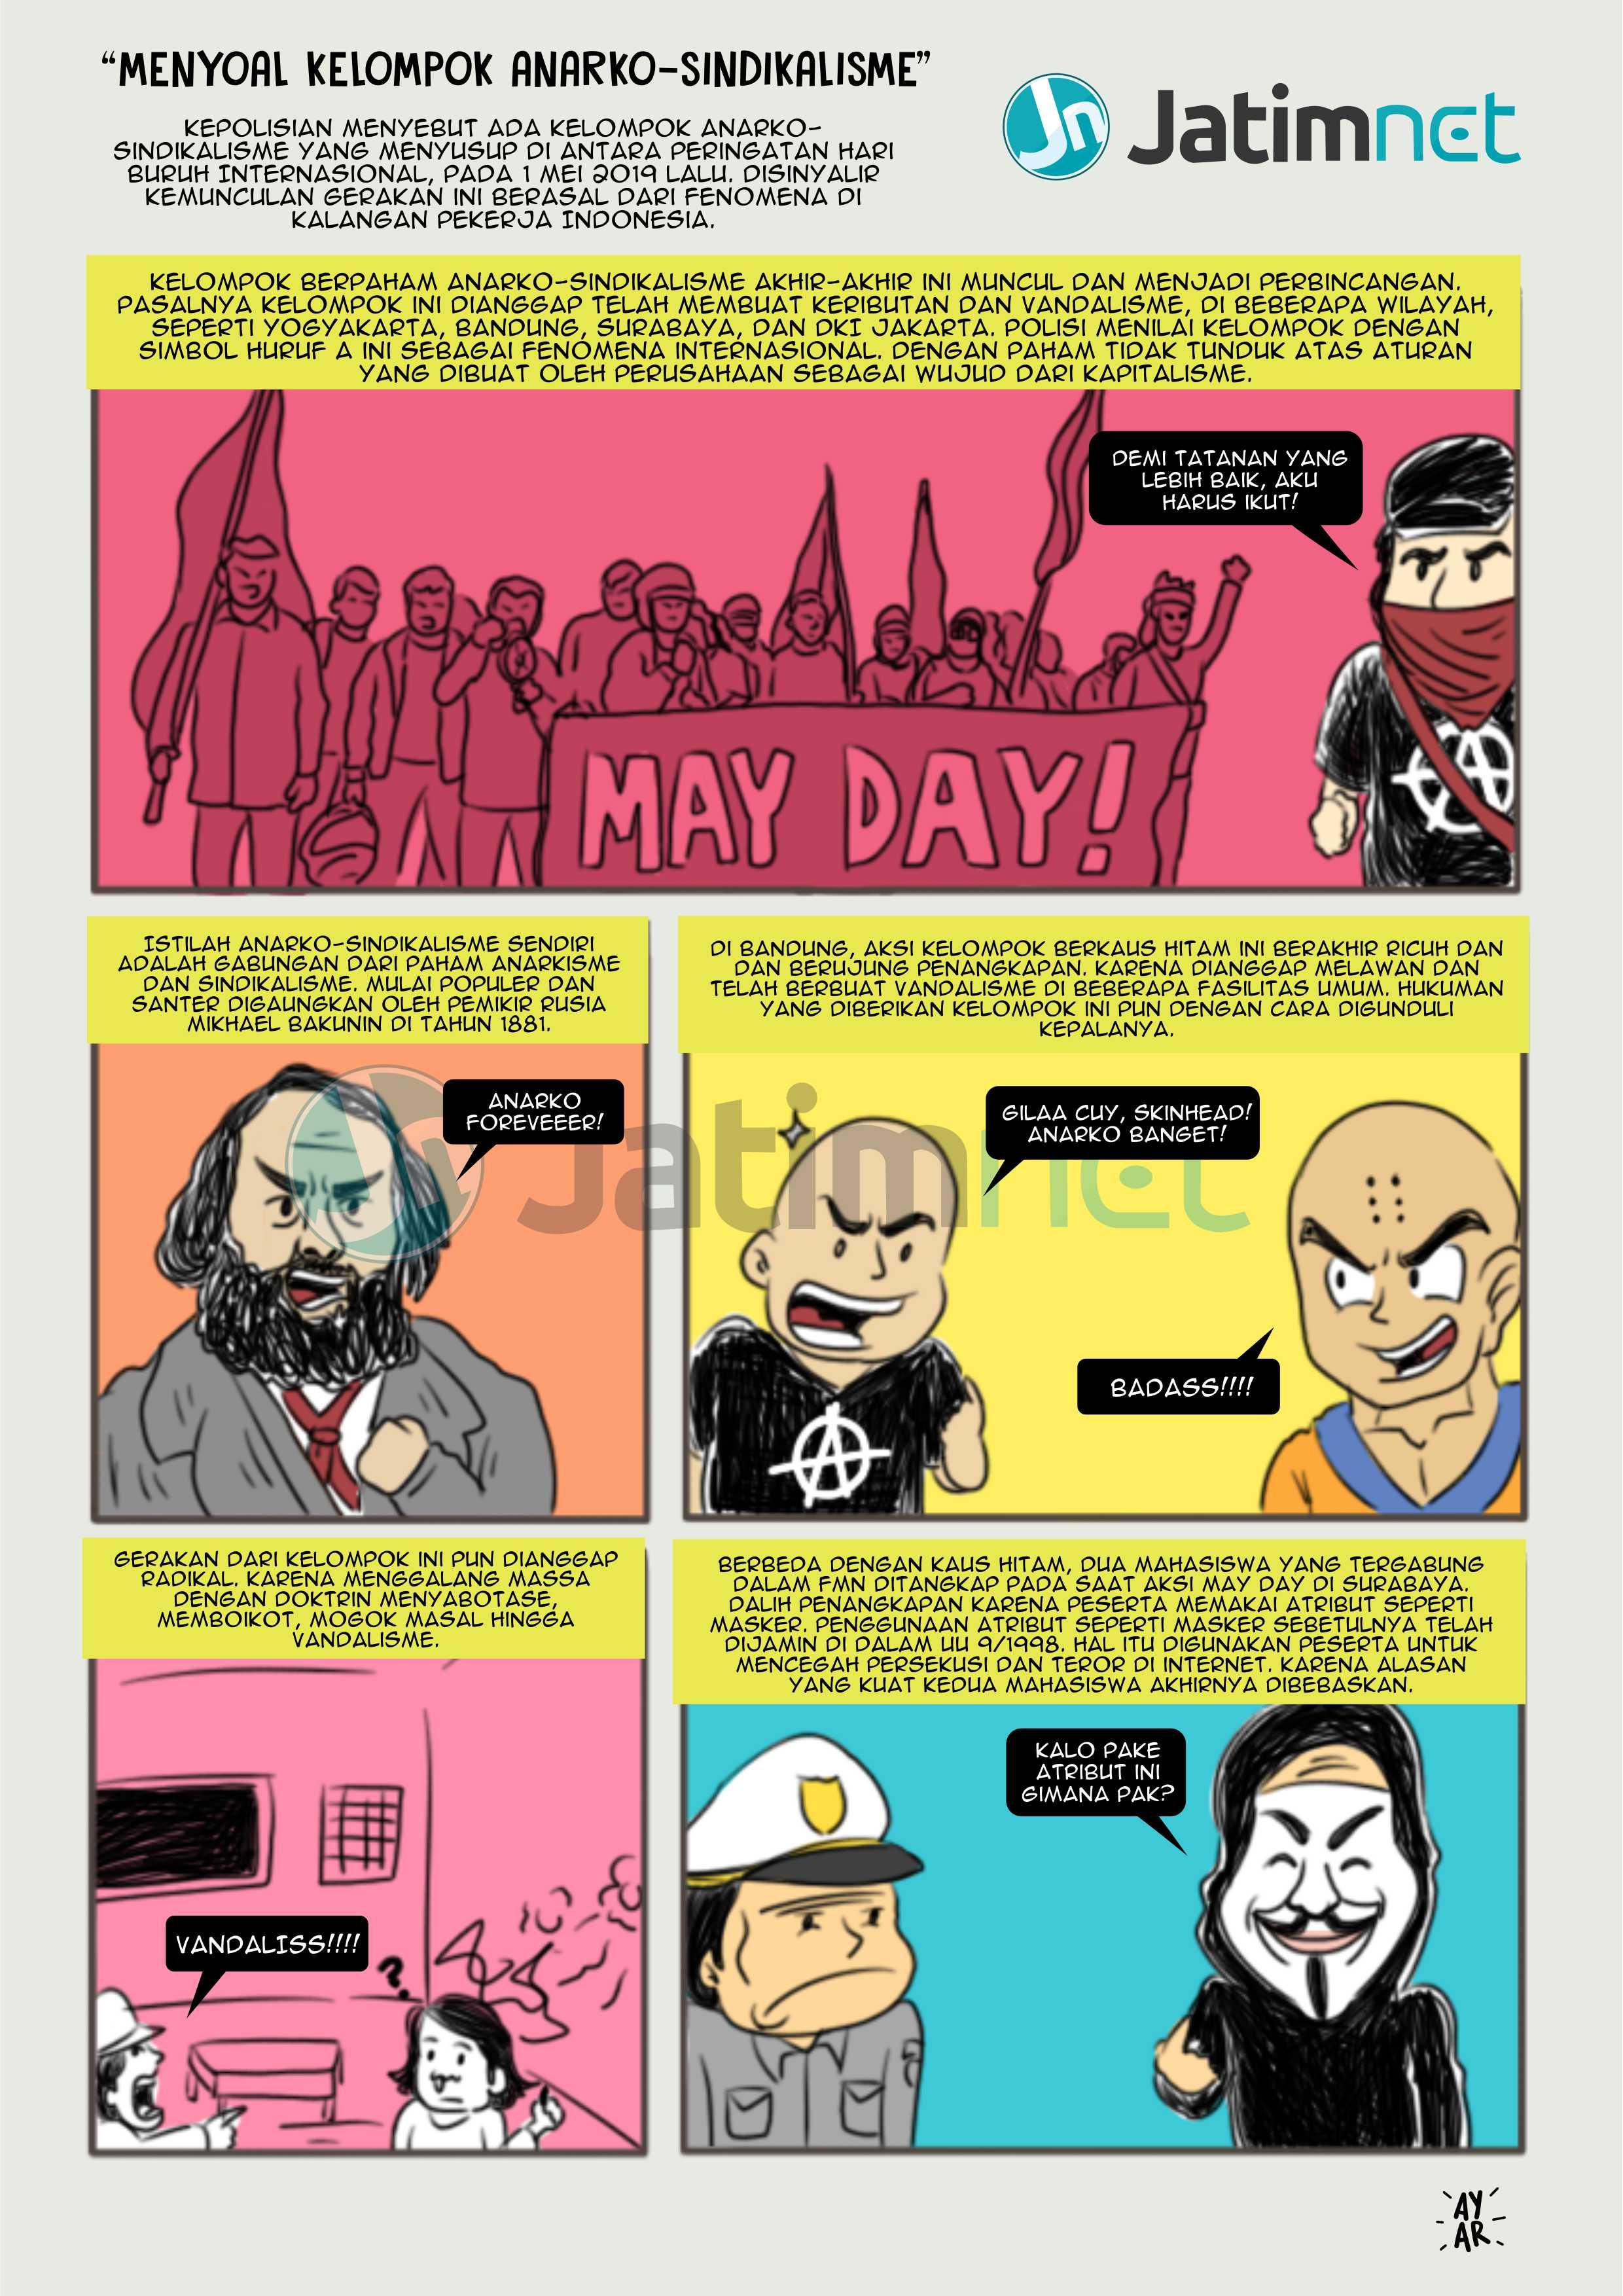 anarko-sindikalis-dan-may-day